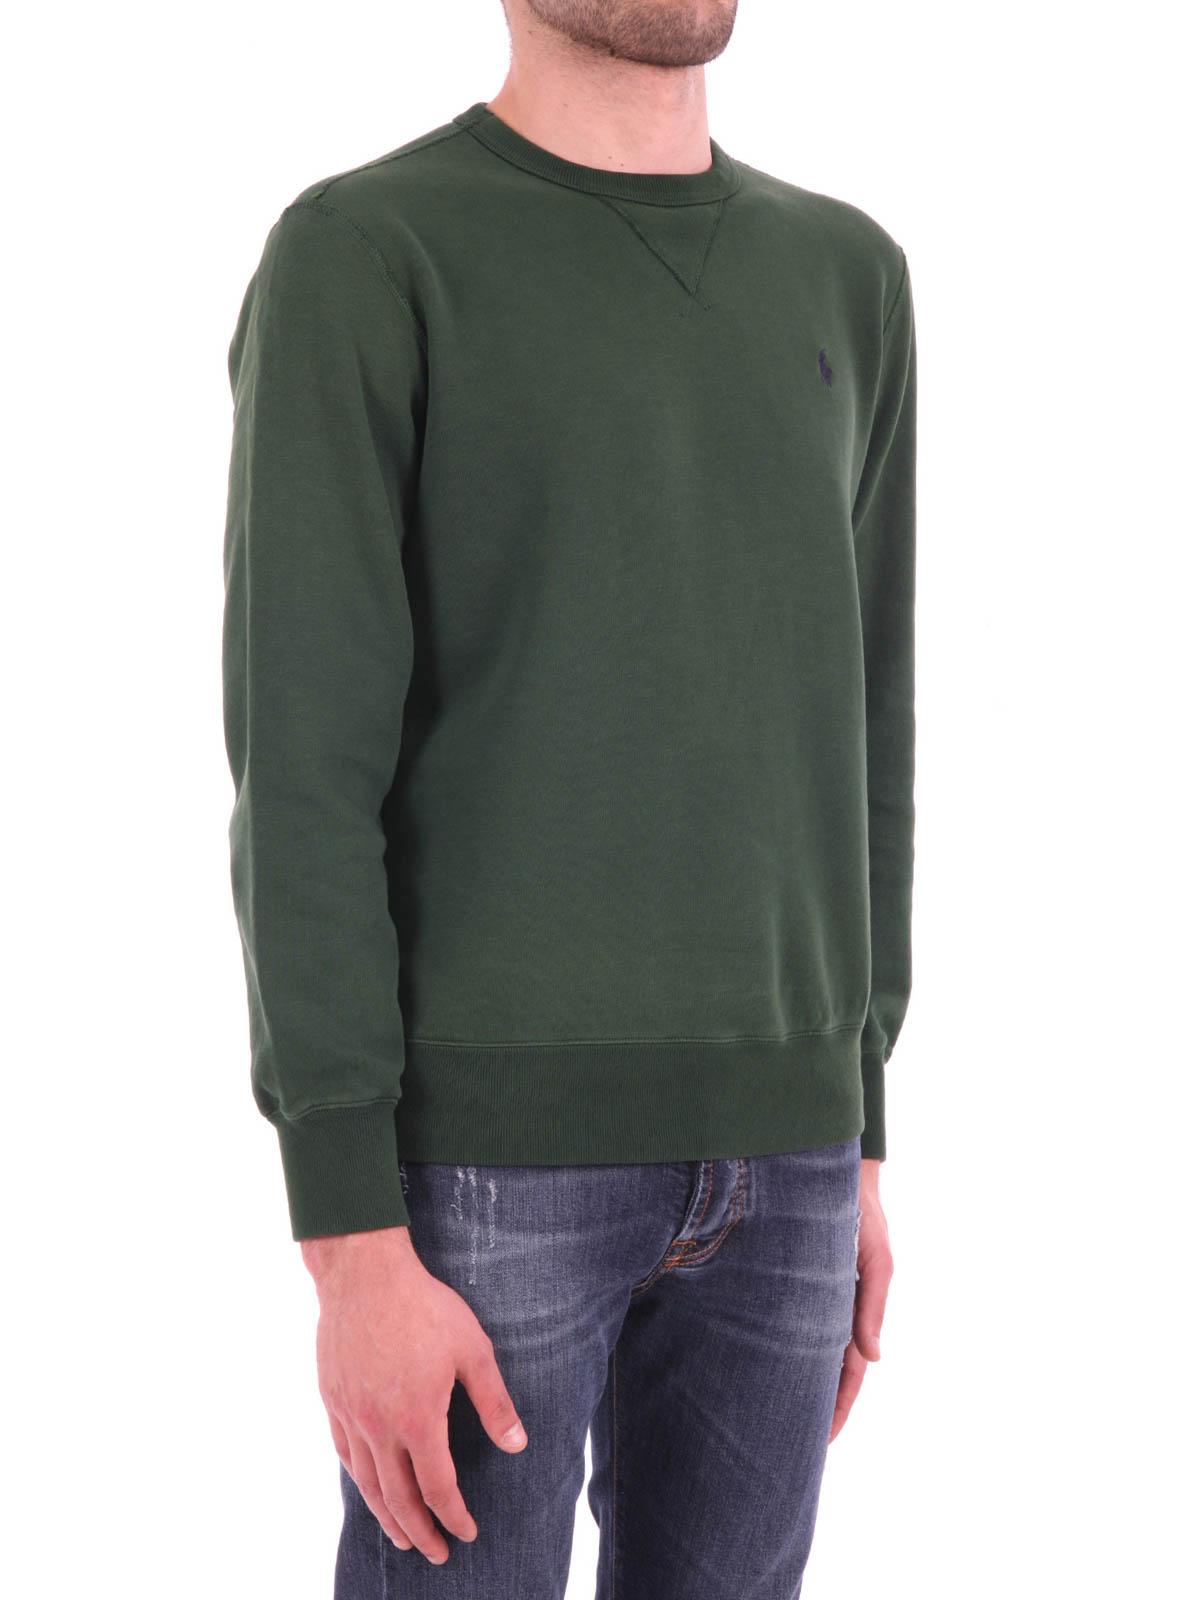 Foncé Pulls Vert Lauren Ralph Shirts Sweatshirts Polo Et Sweat 6ymY7fvbgI